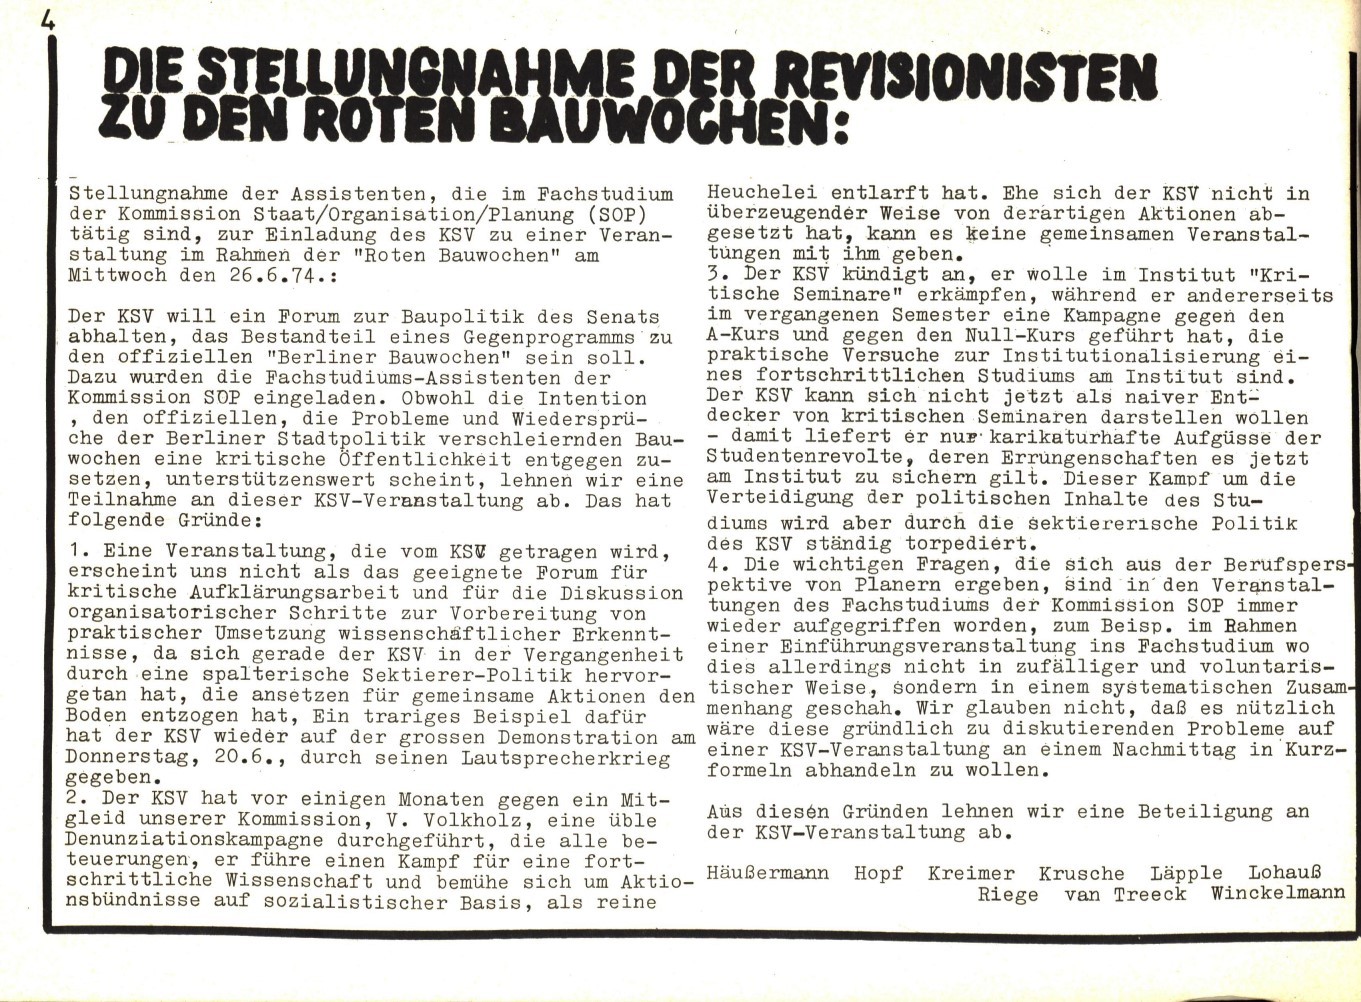 Berlin_KSV_1974_Rote_Bauwochen_09